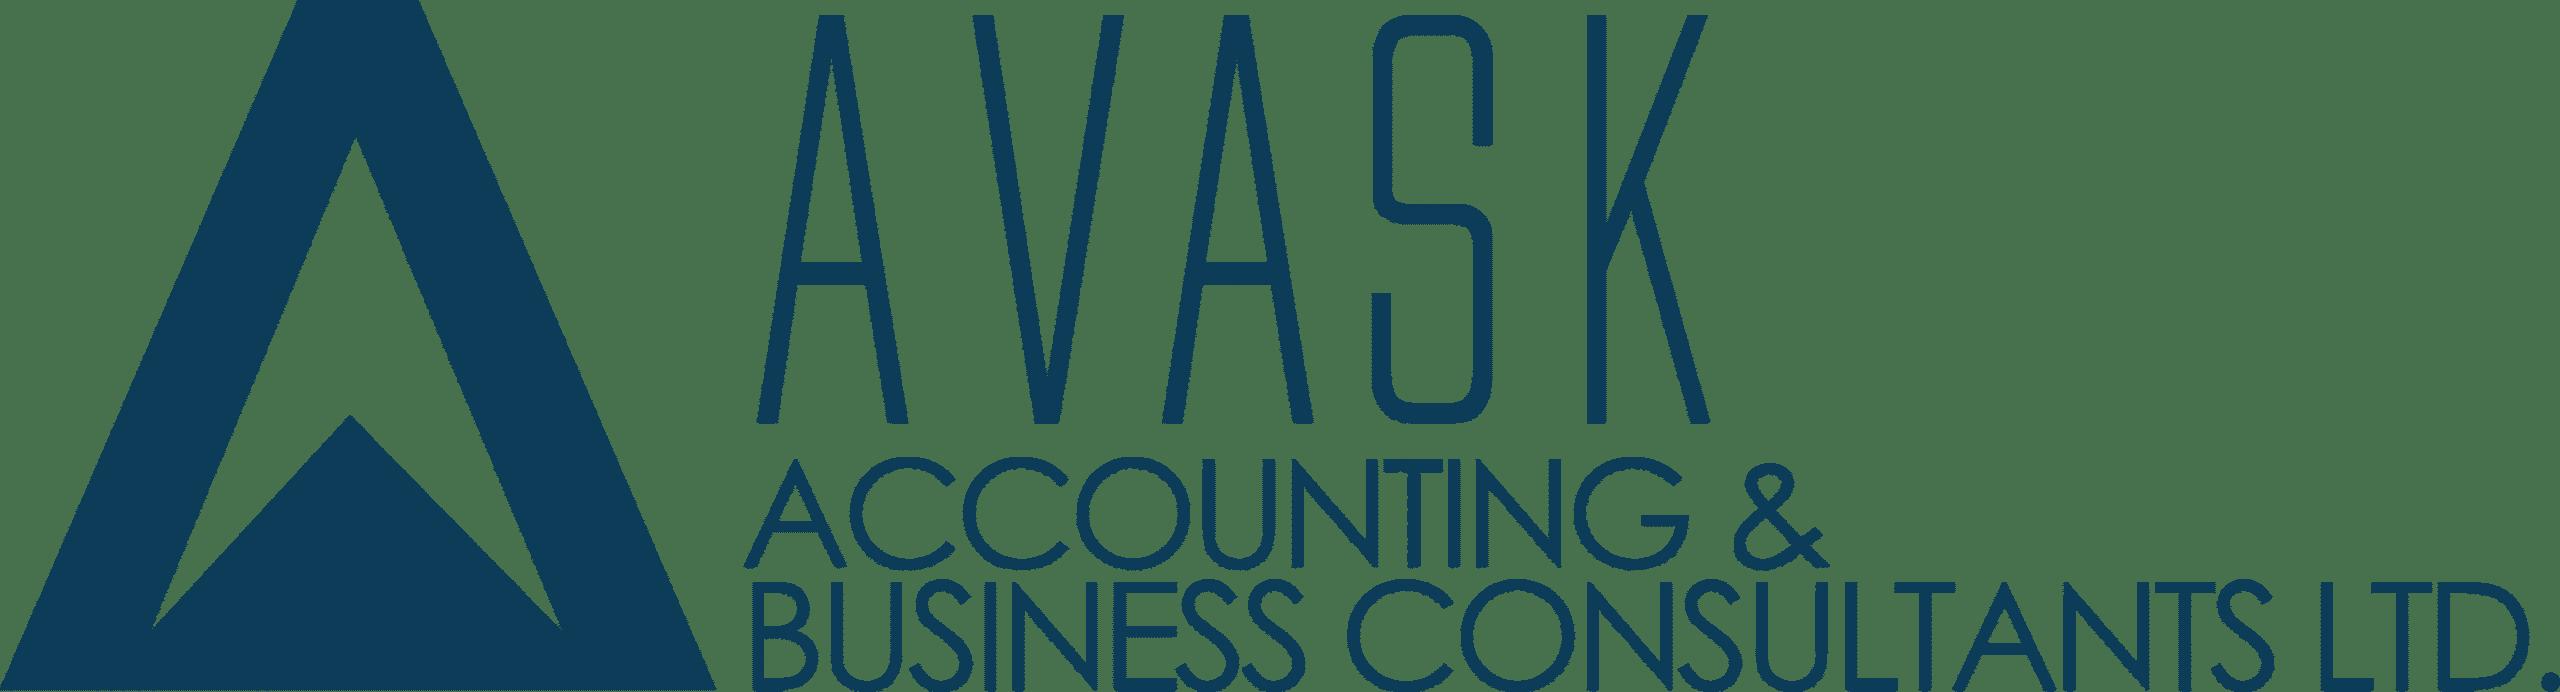 2020 - AVASK logo dark blue